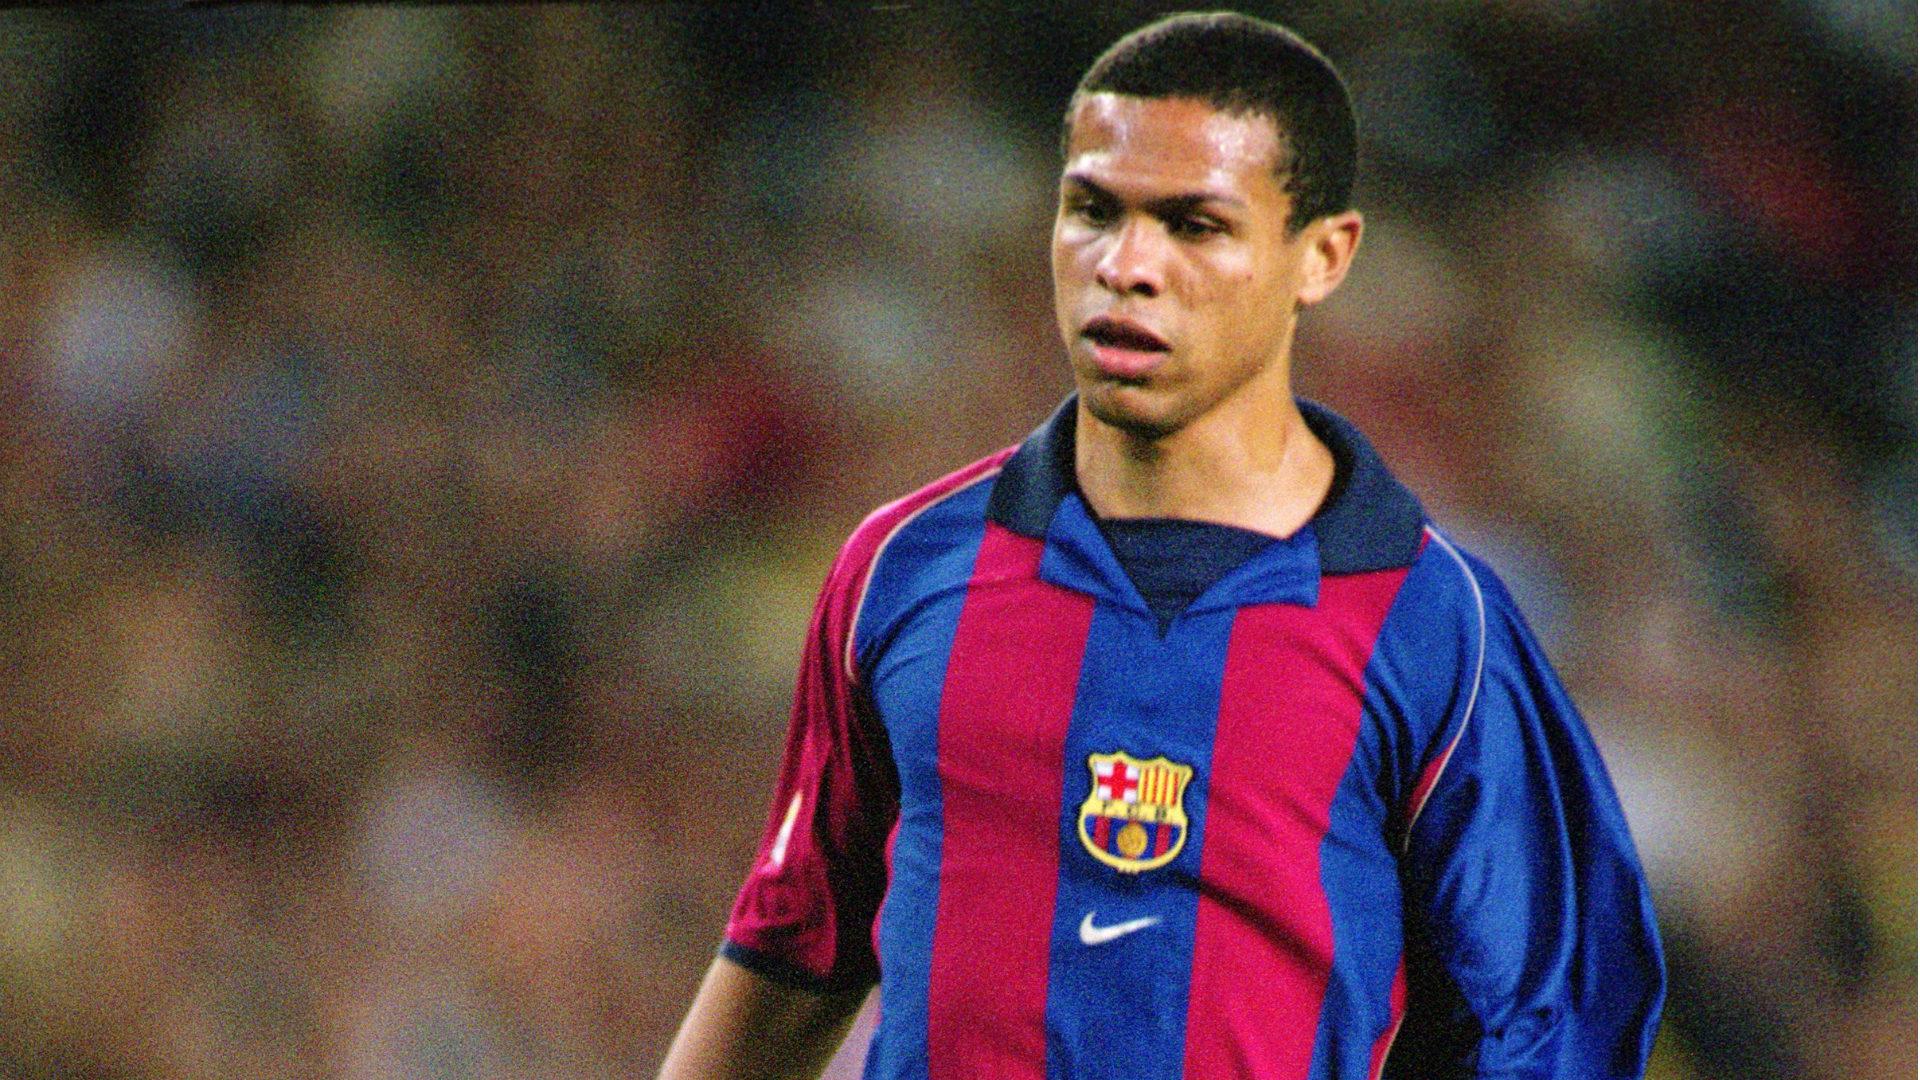 Geovanni ex Barcelona player